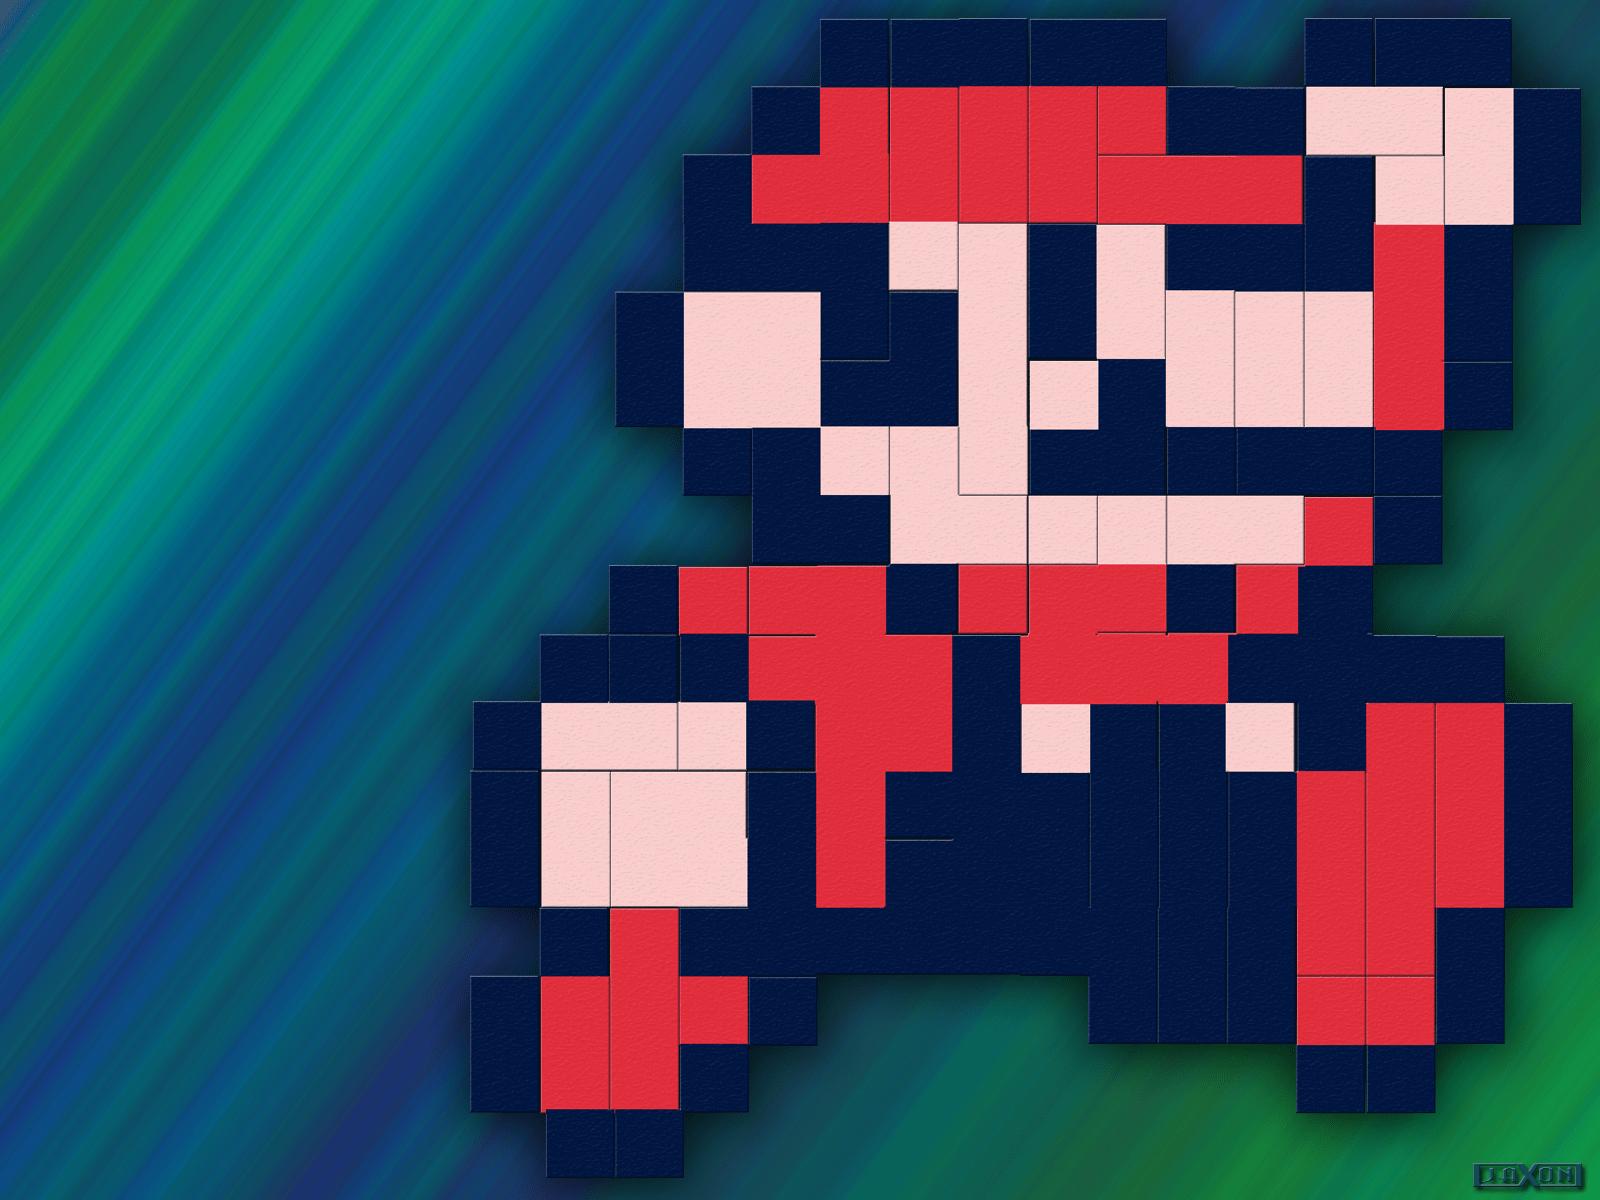 Mario Iphone Wallpaper Hd Super Mario Bros Wallpaper And Background 1600x1200